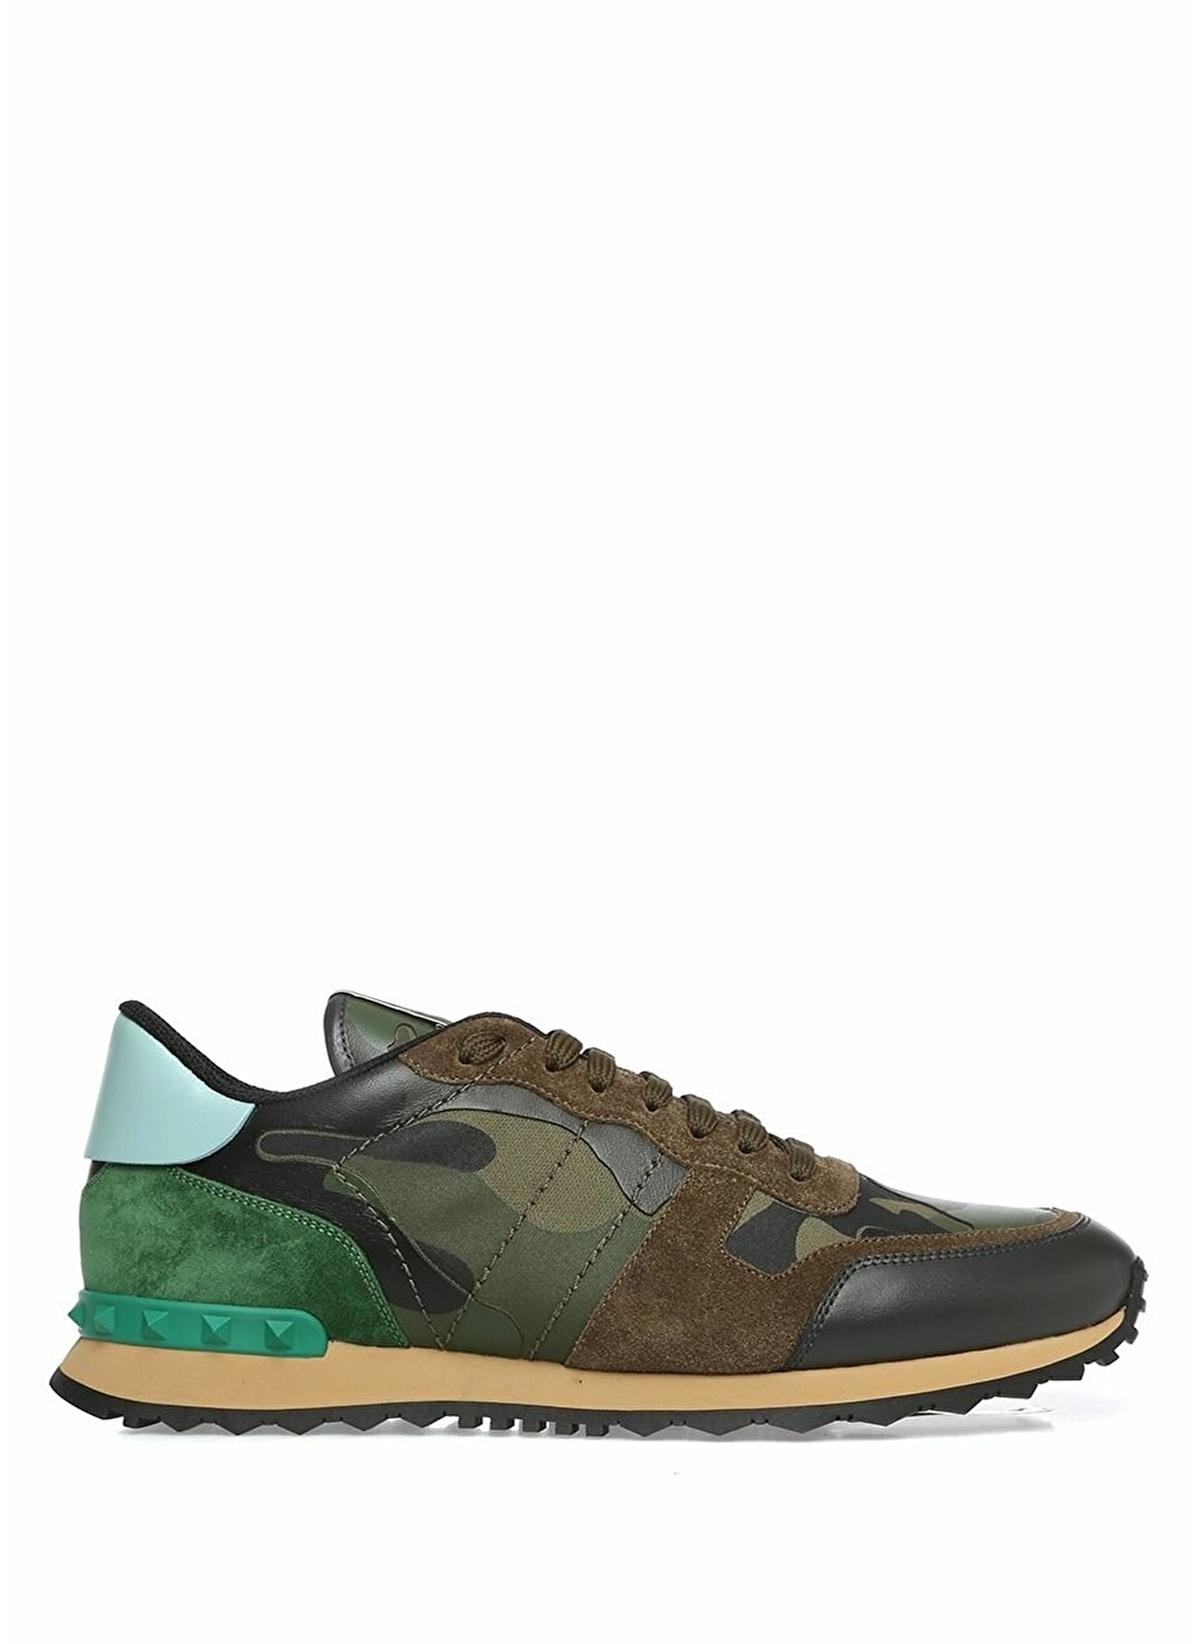 Valentino Lifestyle Ayakkabı 3150.0 Tl